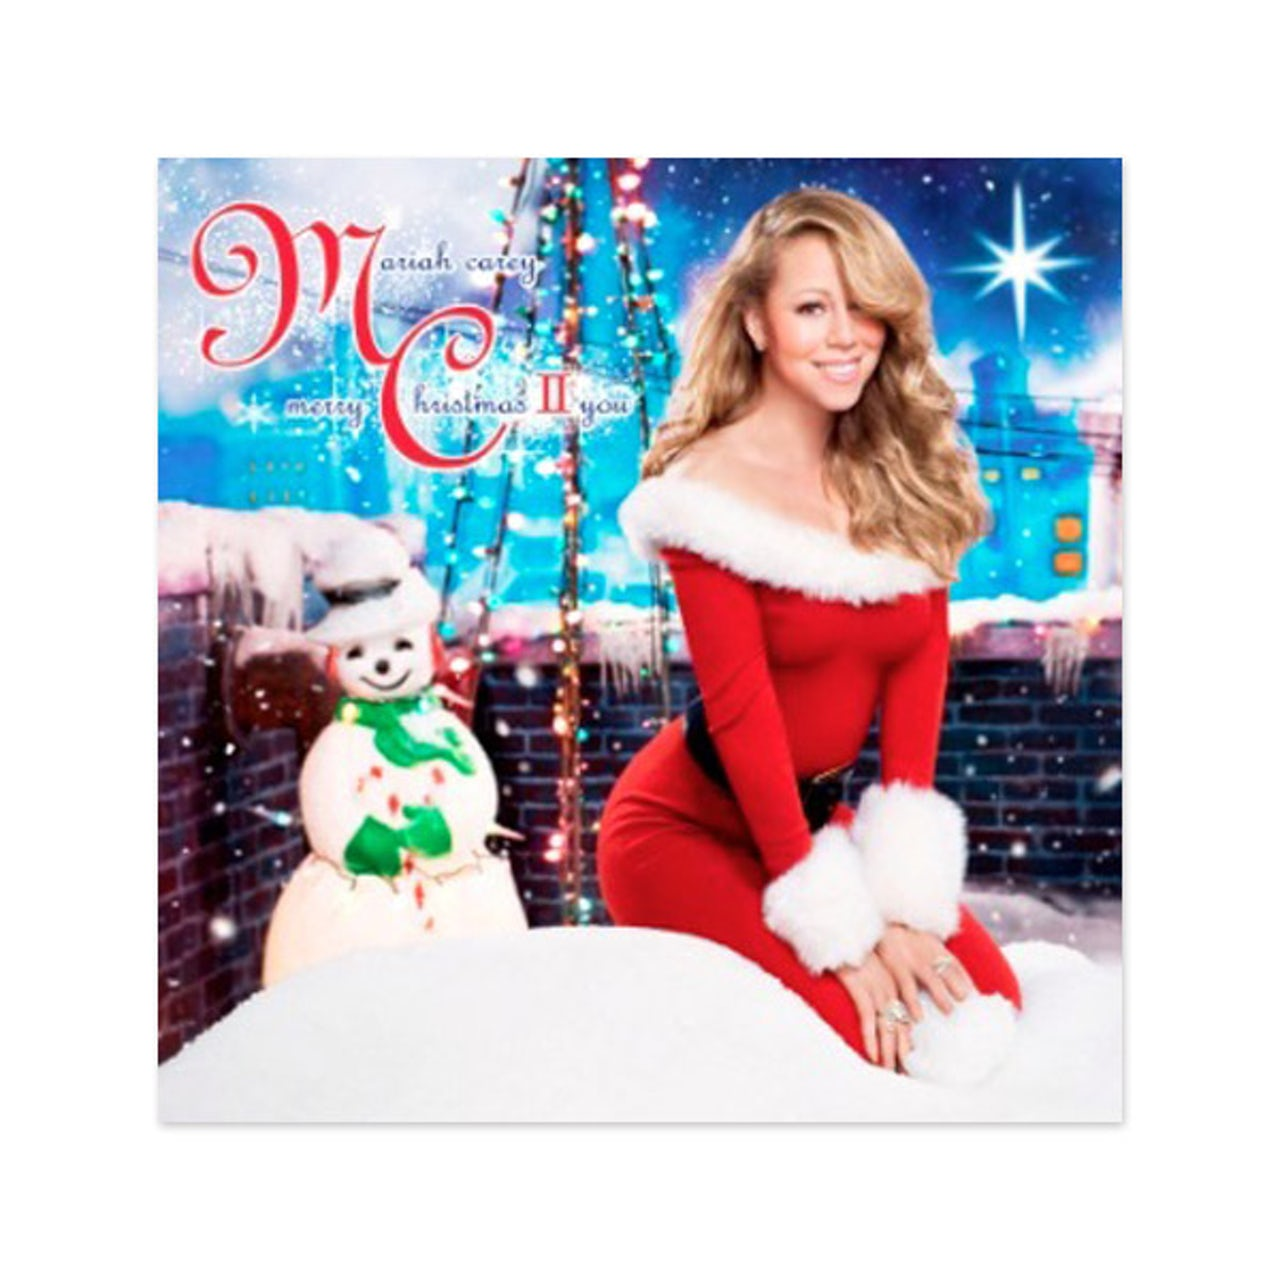 Mariah Carey Christmas Album Cover.Mariah Carey Merry Christmas Ii You Standard Cd